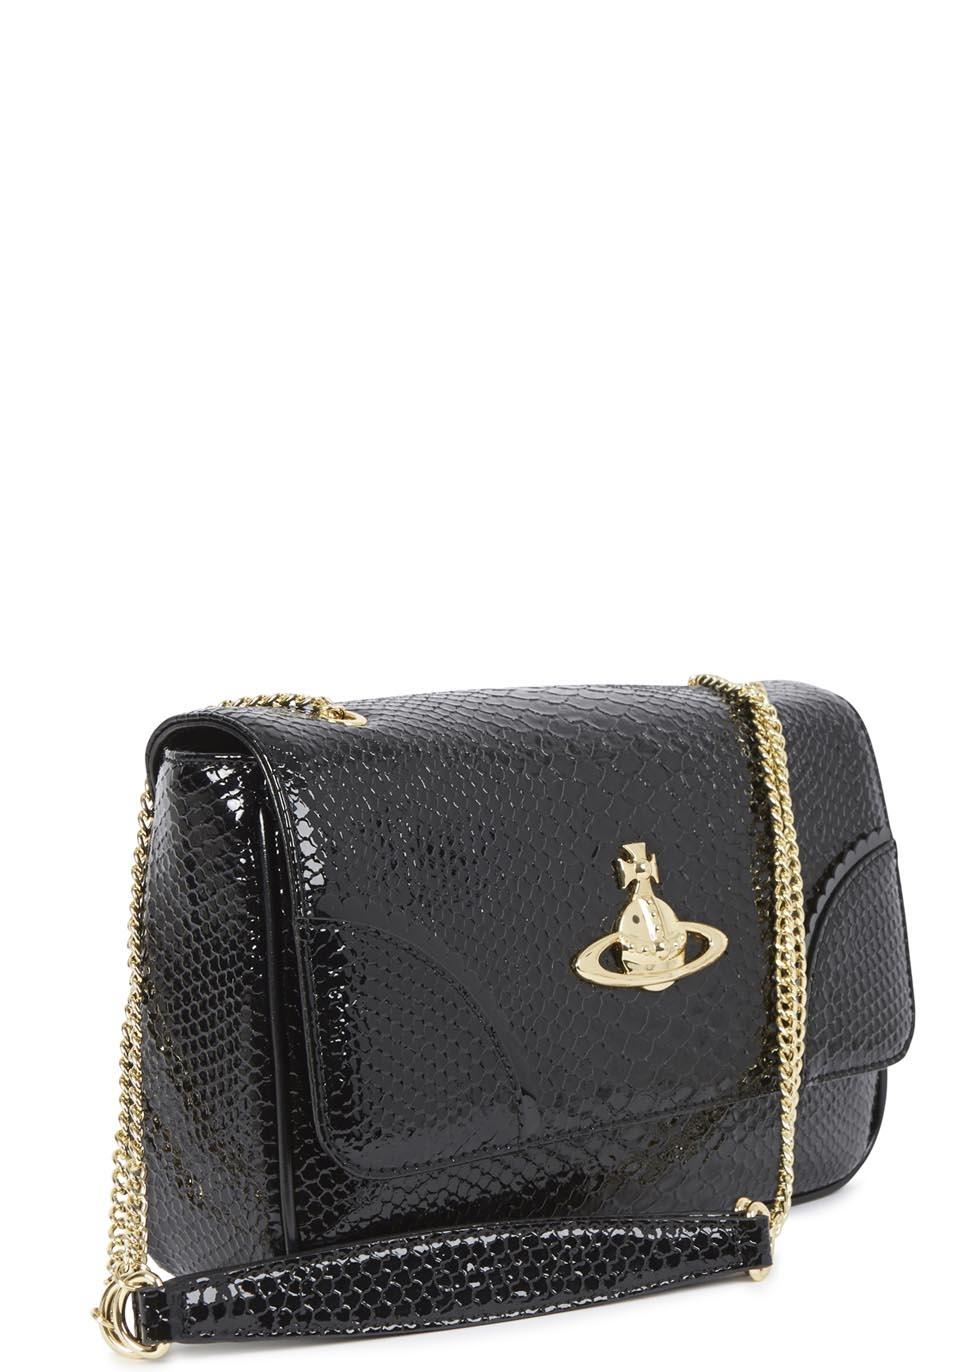 d064f416c3 Vivienne Westwood Anglomania Frilly Snake Black Patent Leather Shoulder Bag  in Black - Lyst